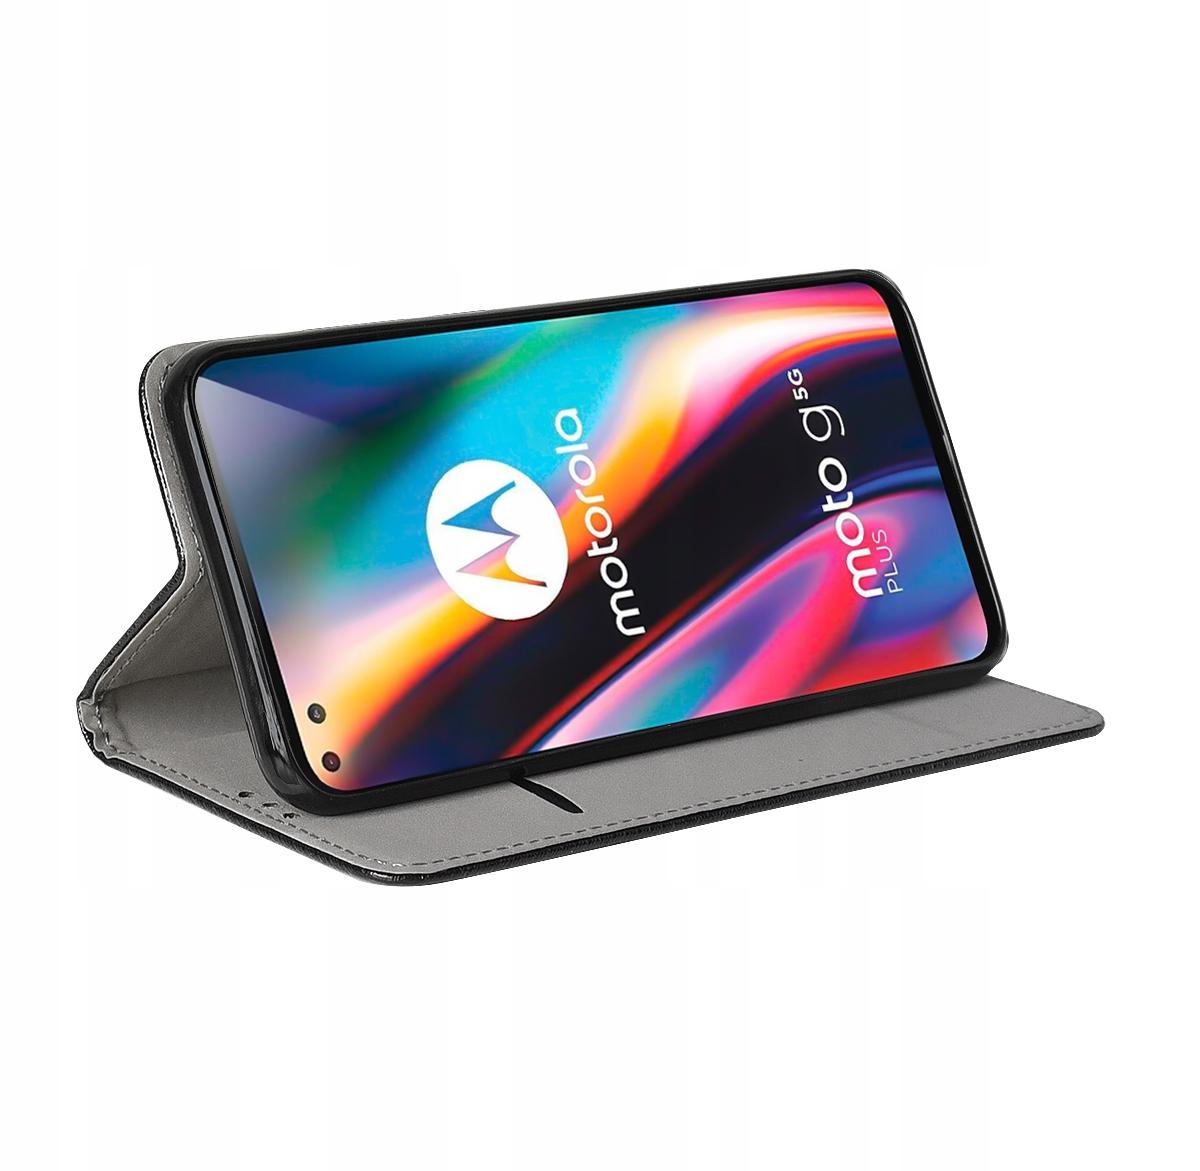 Etui do Motorola Moto G 5G Plus Case Magnet +Szkło Producent INNY